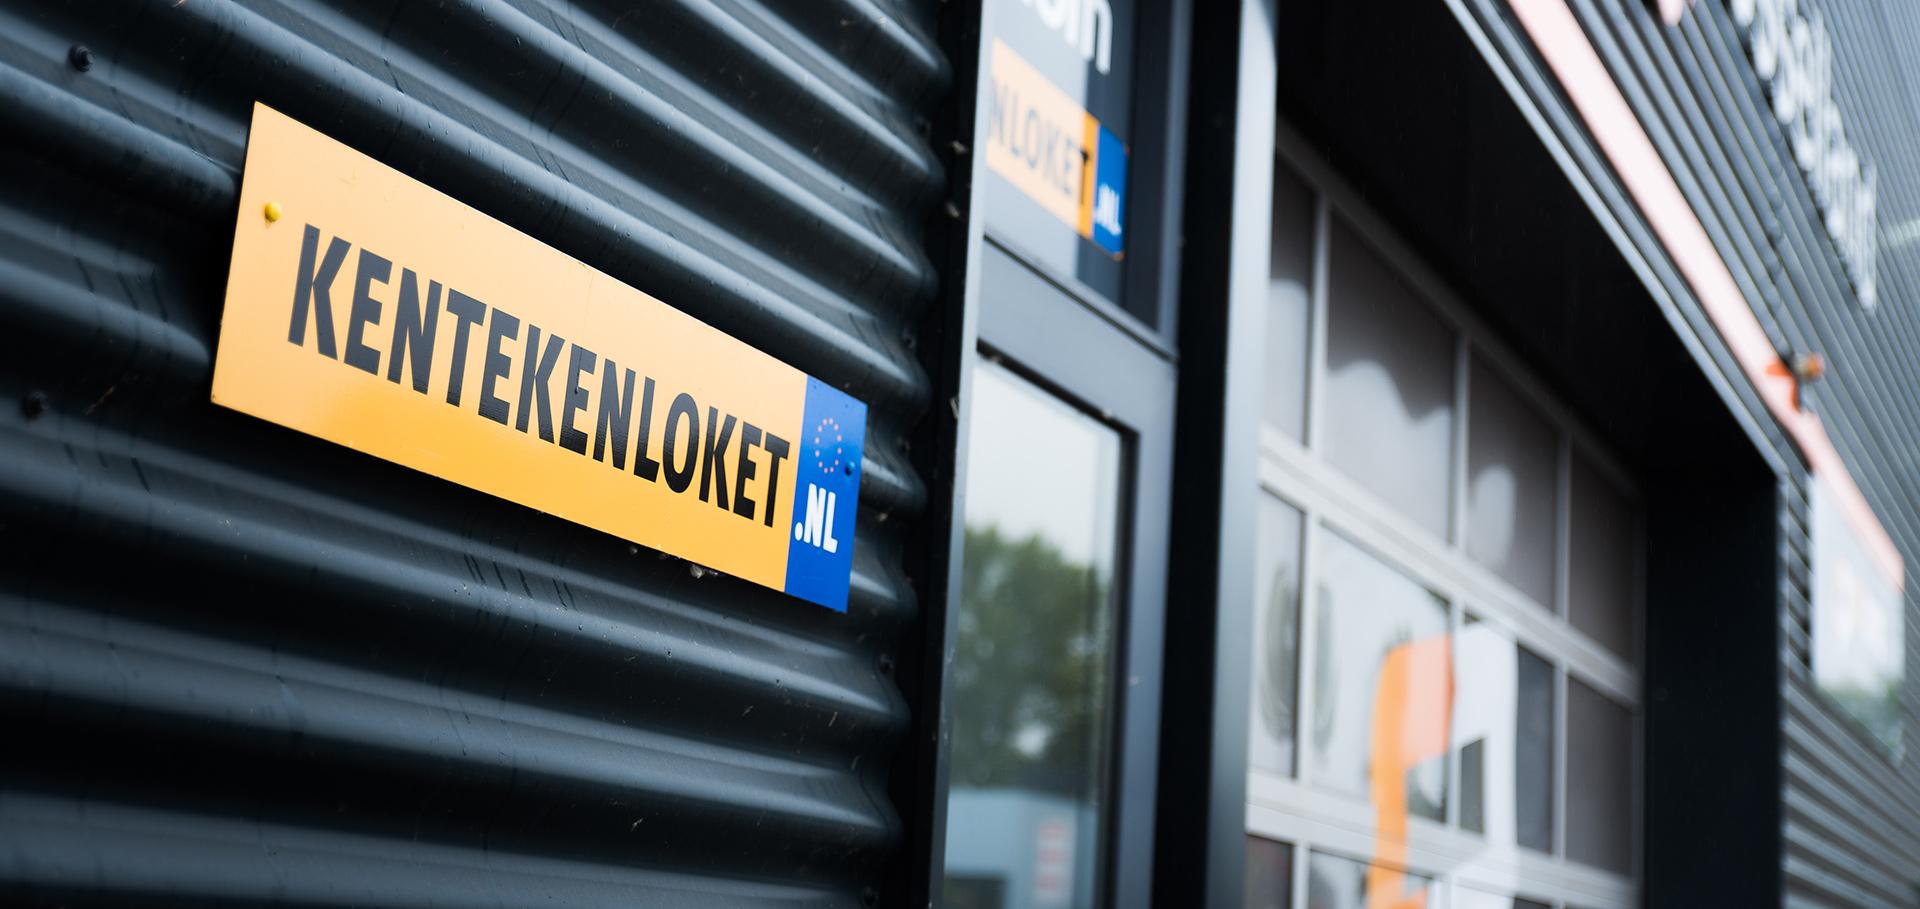 Kentekenloket Zwolle